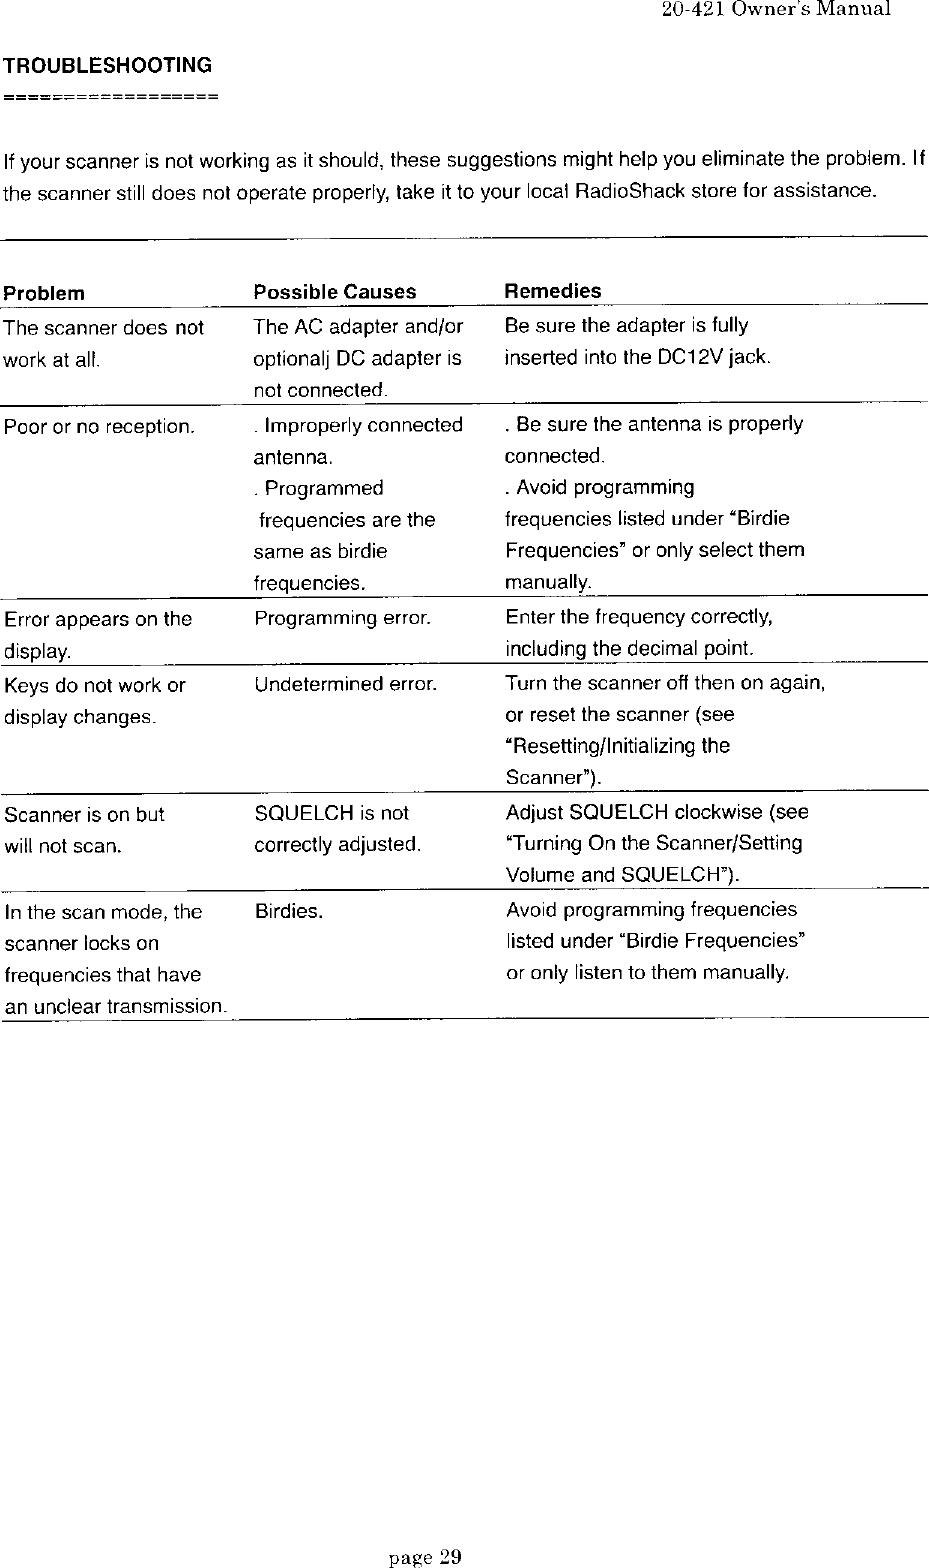 Radio Shack 2000421 User Manual 8